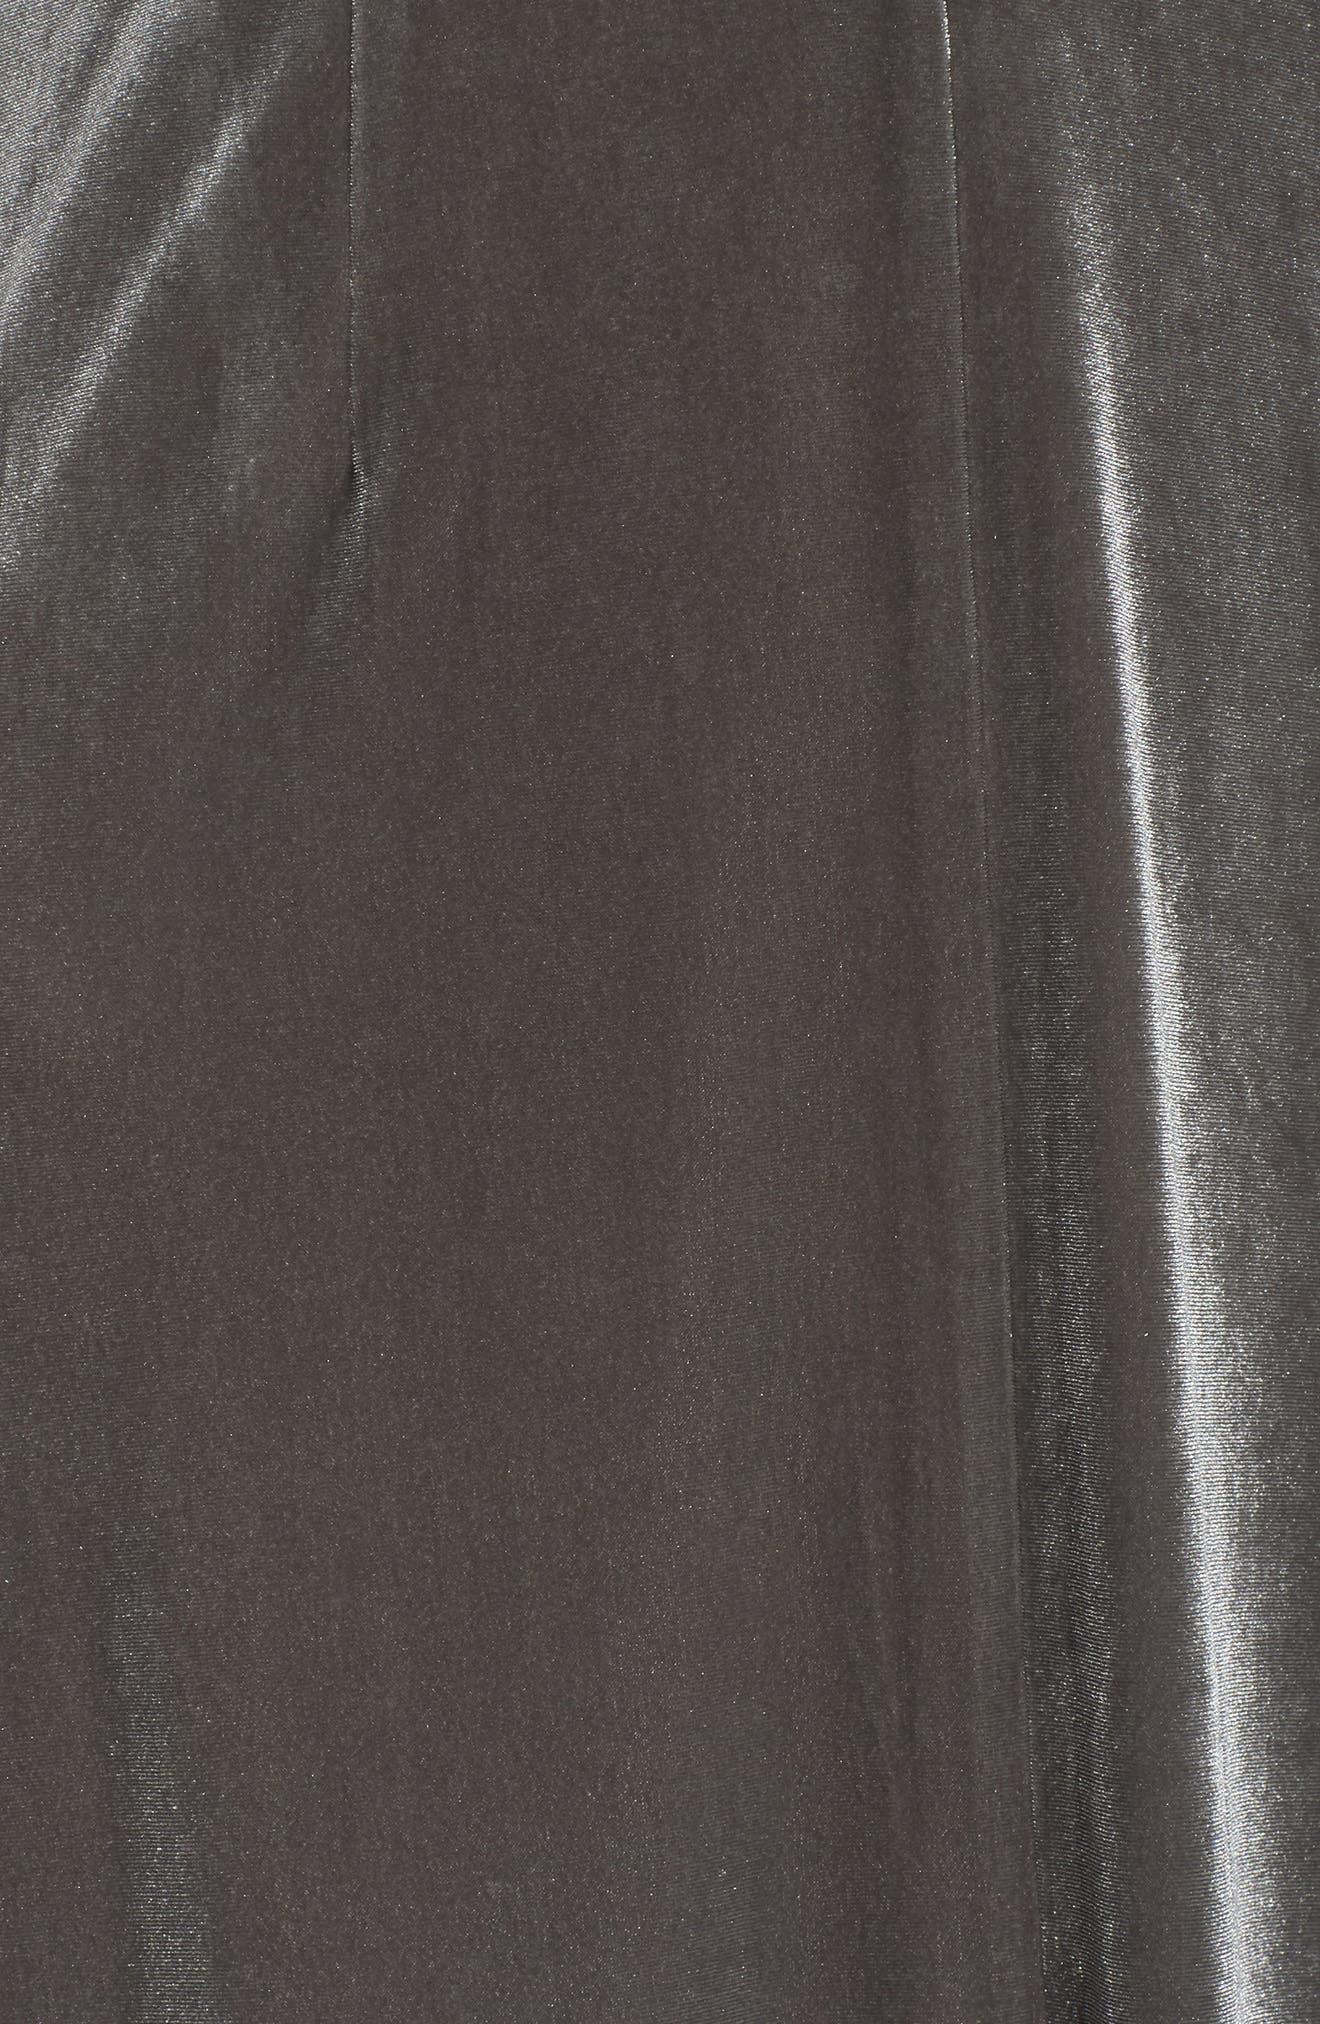 Velvet Lace Up Dress,                             Alternate thumbnail 5, color,                             039